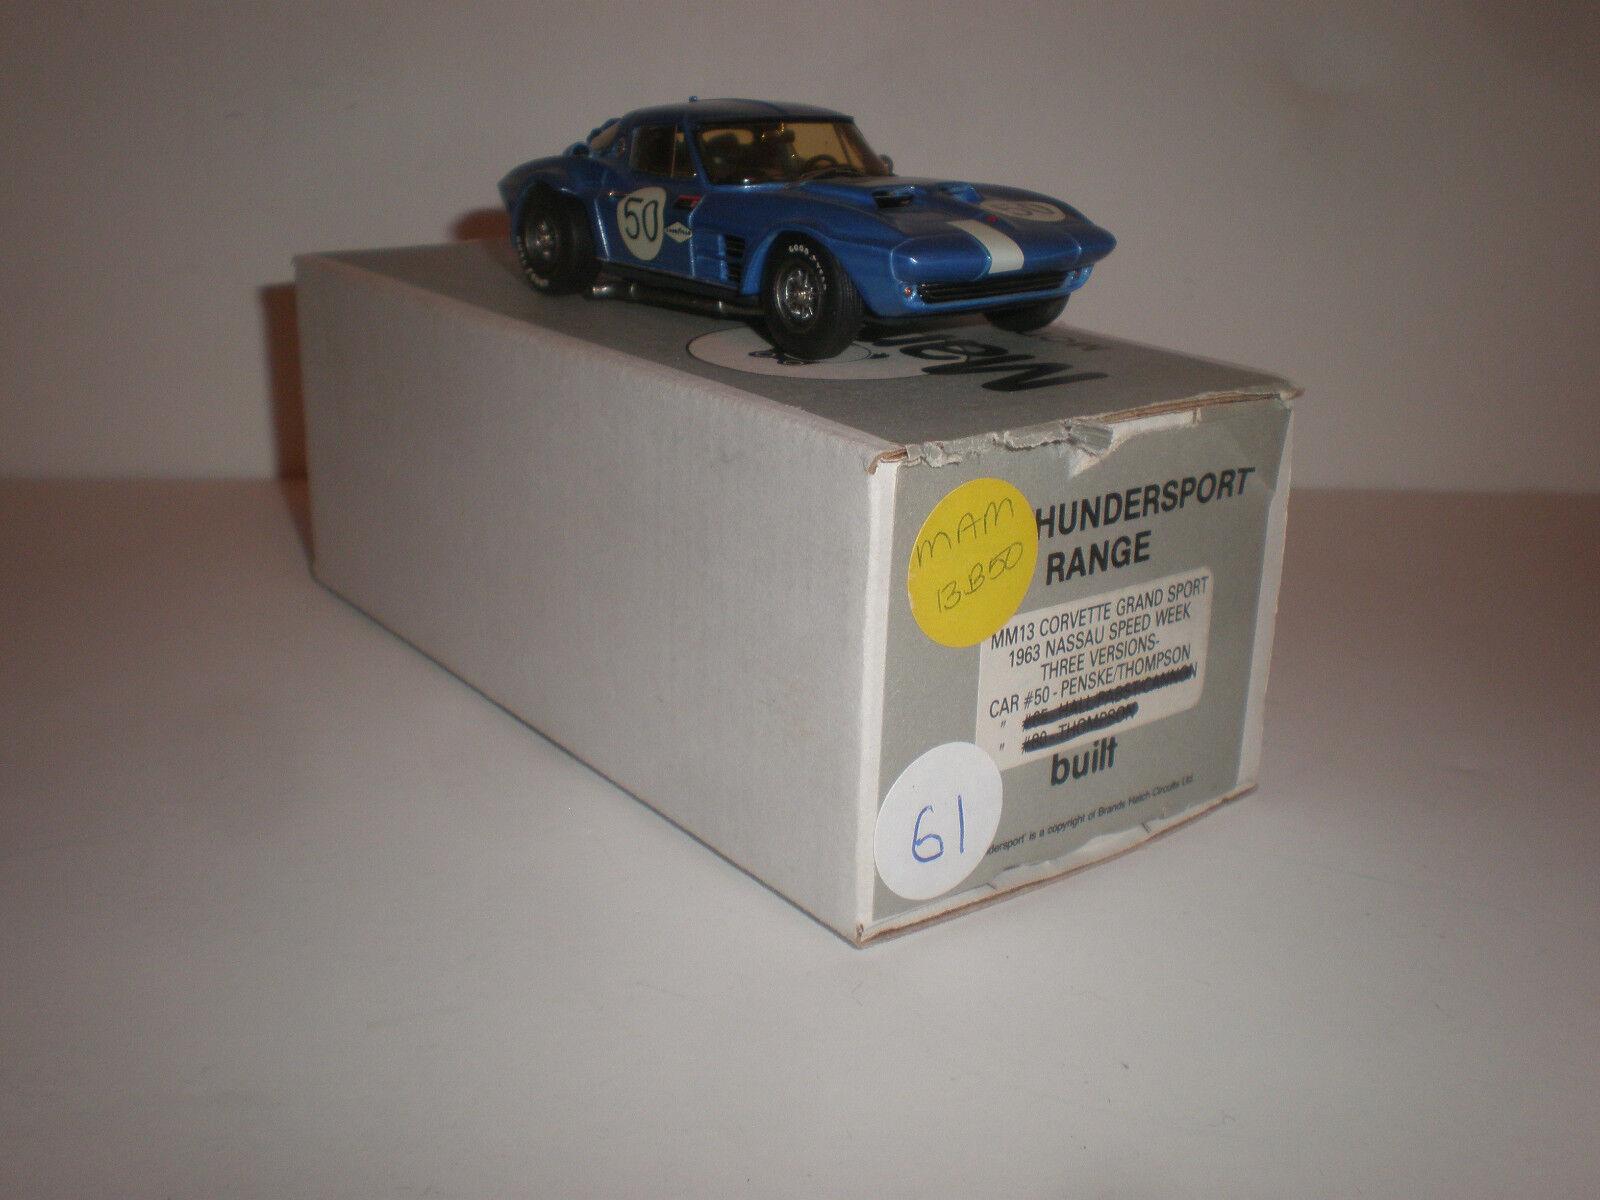 MM13 Corvette Grand Sport 1963 Nassau velocidad semana coche 50 Marsh Models